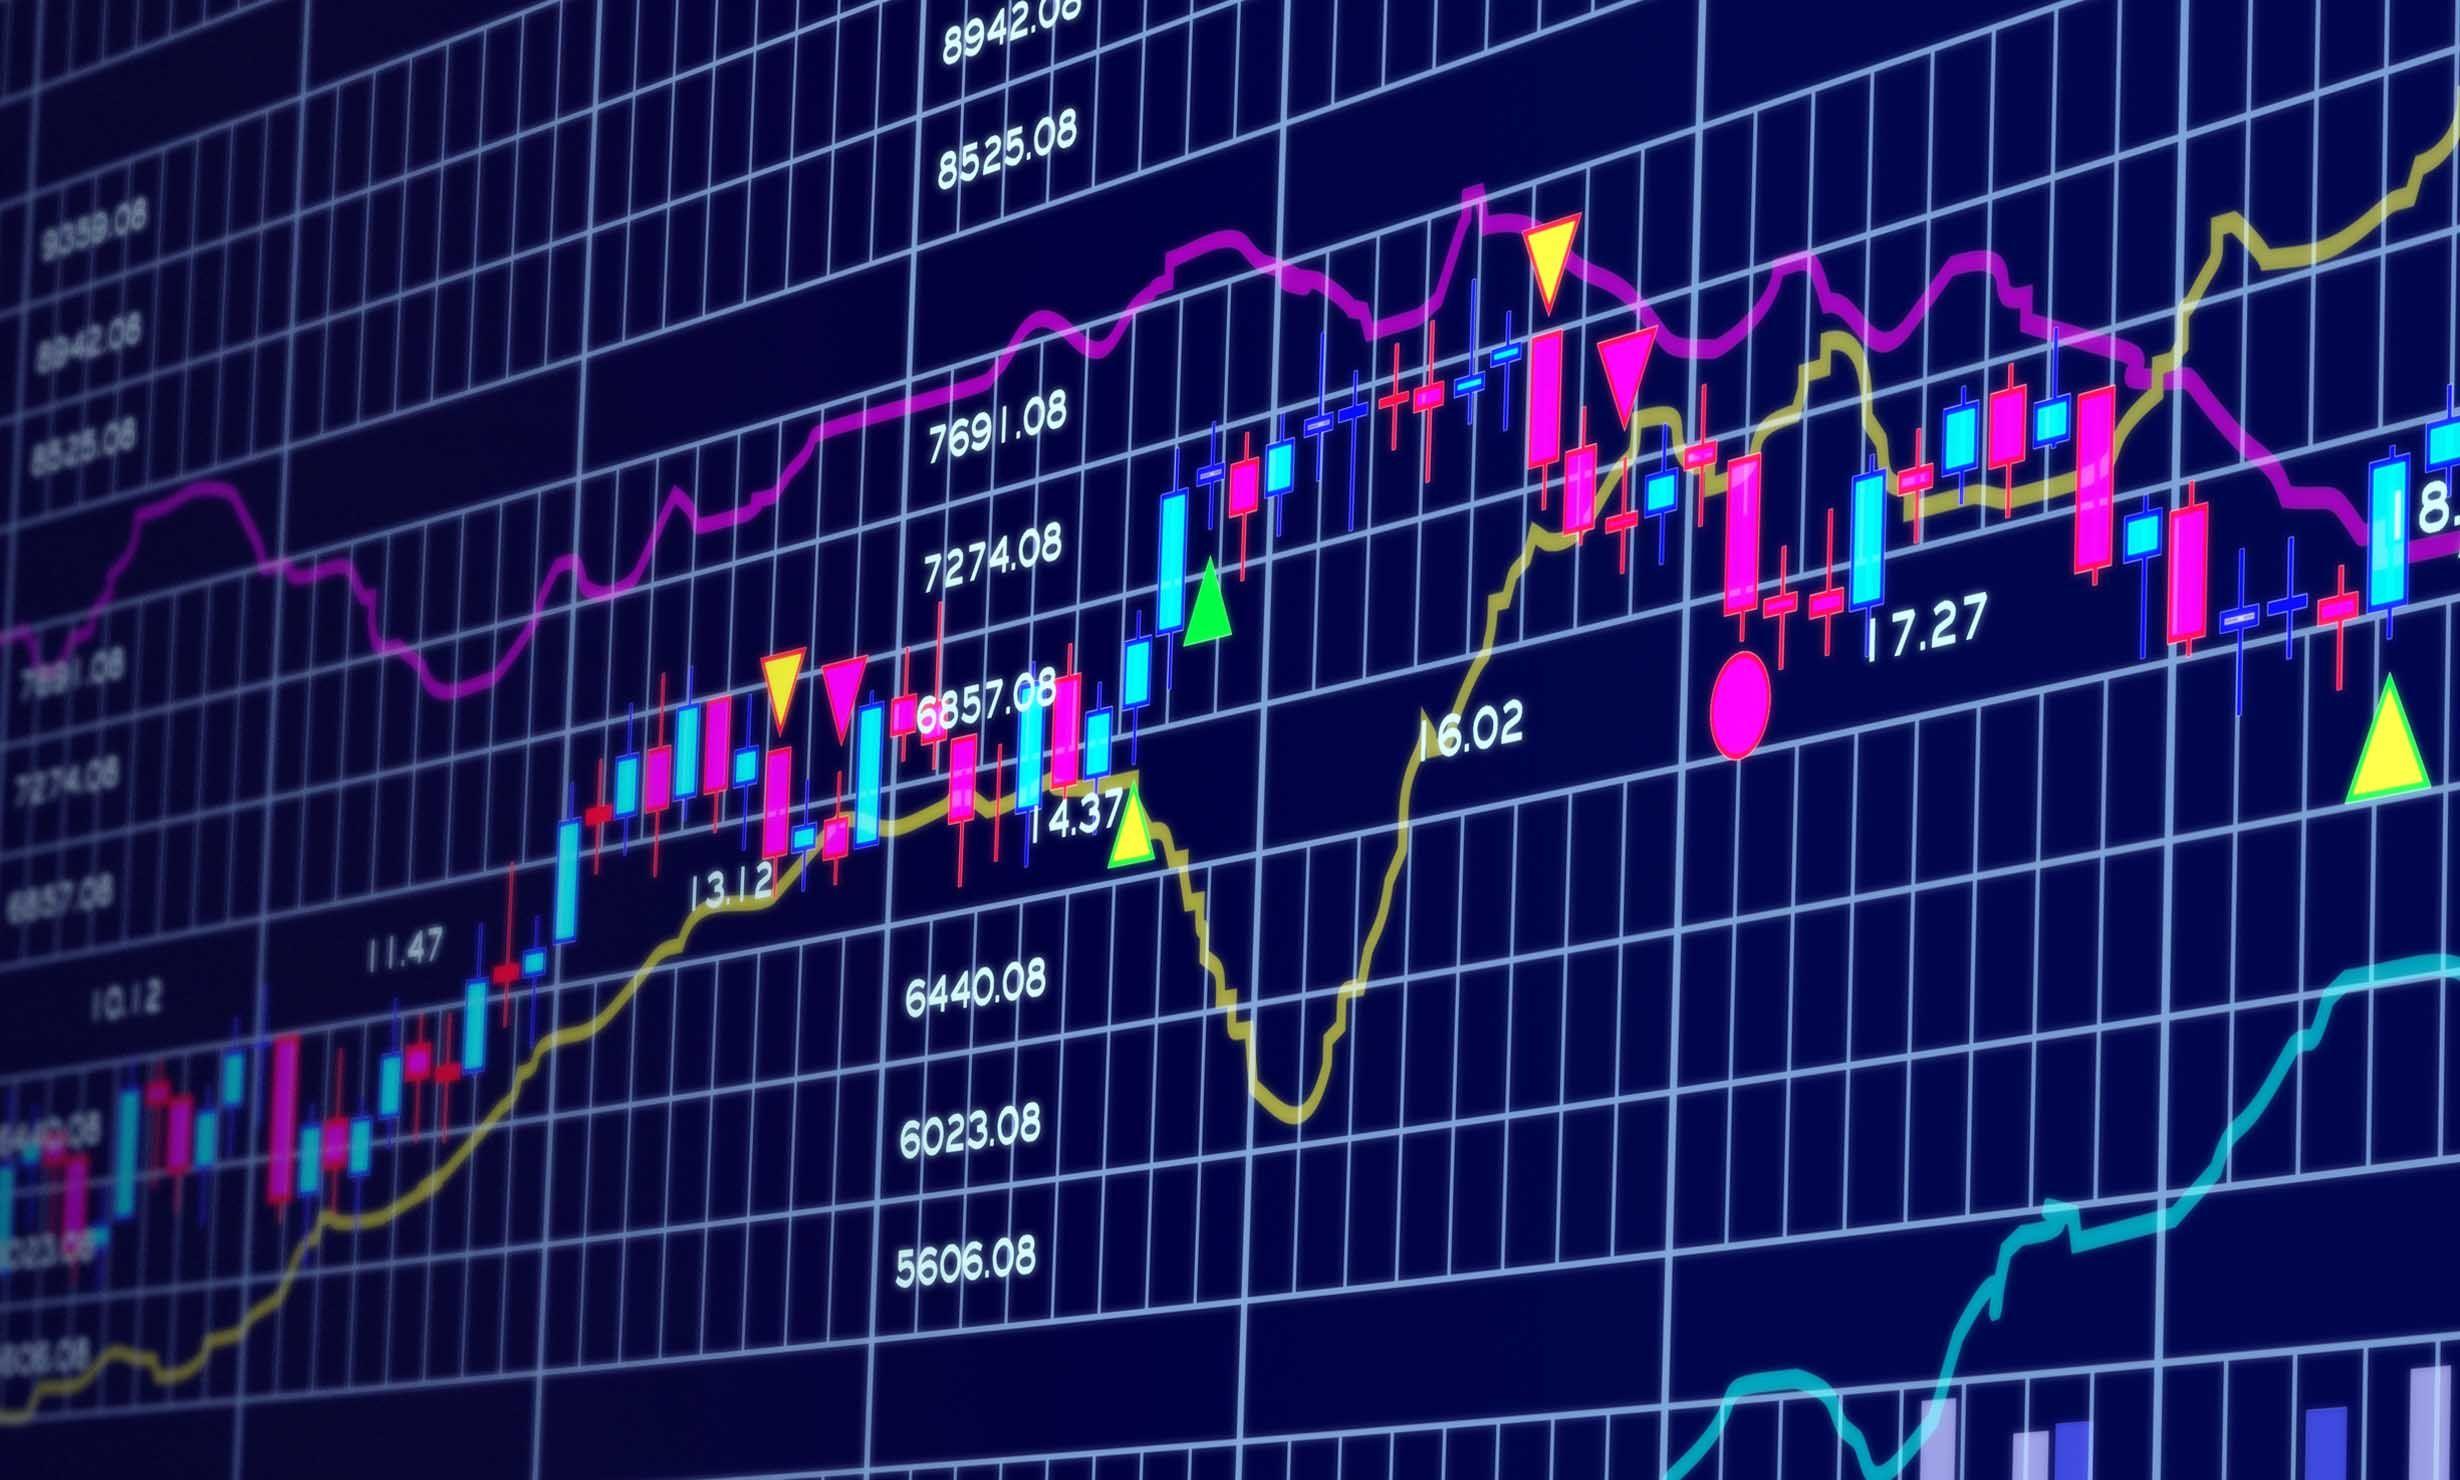 TRADE_L2_Sub-Pillar_Trading_Graphs_o_tcm5044-9557.jpg